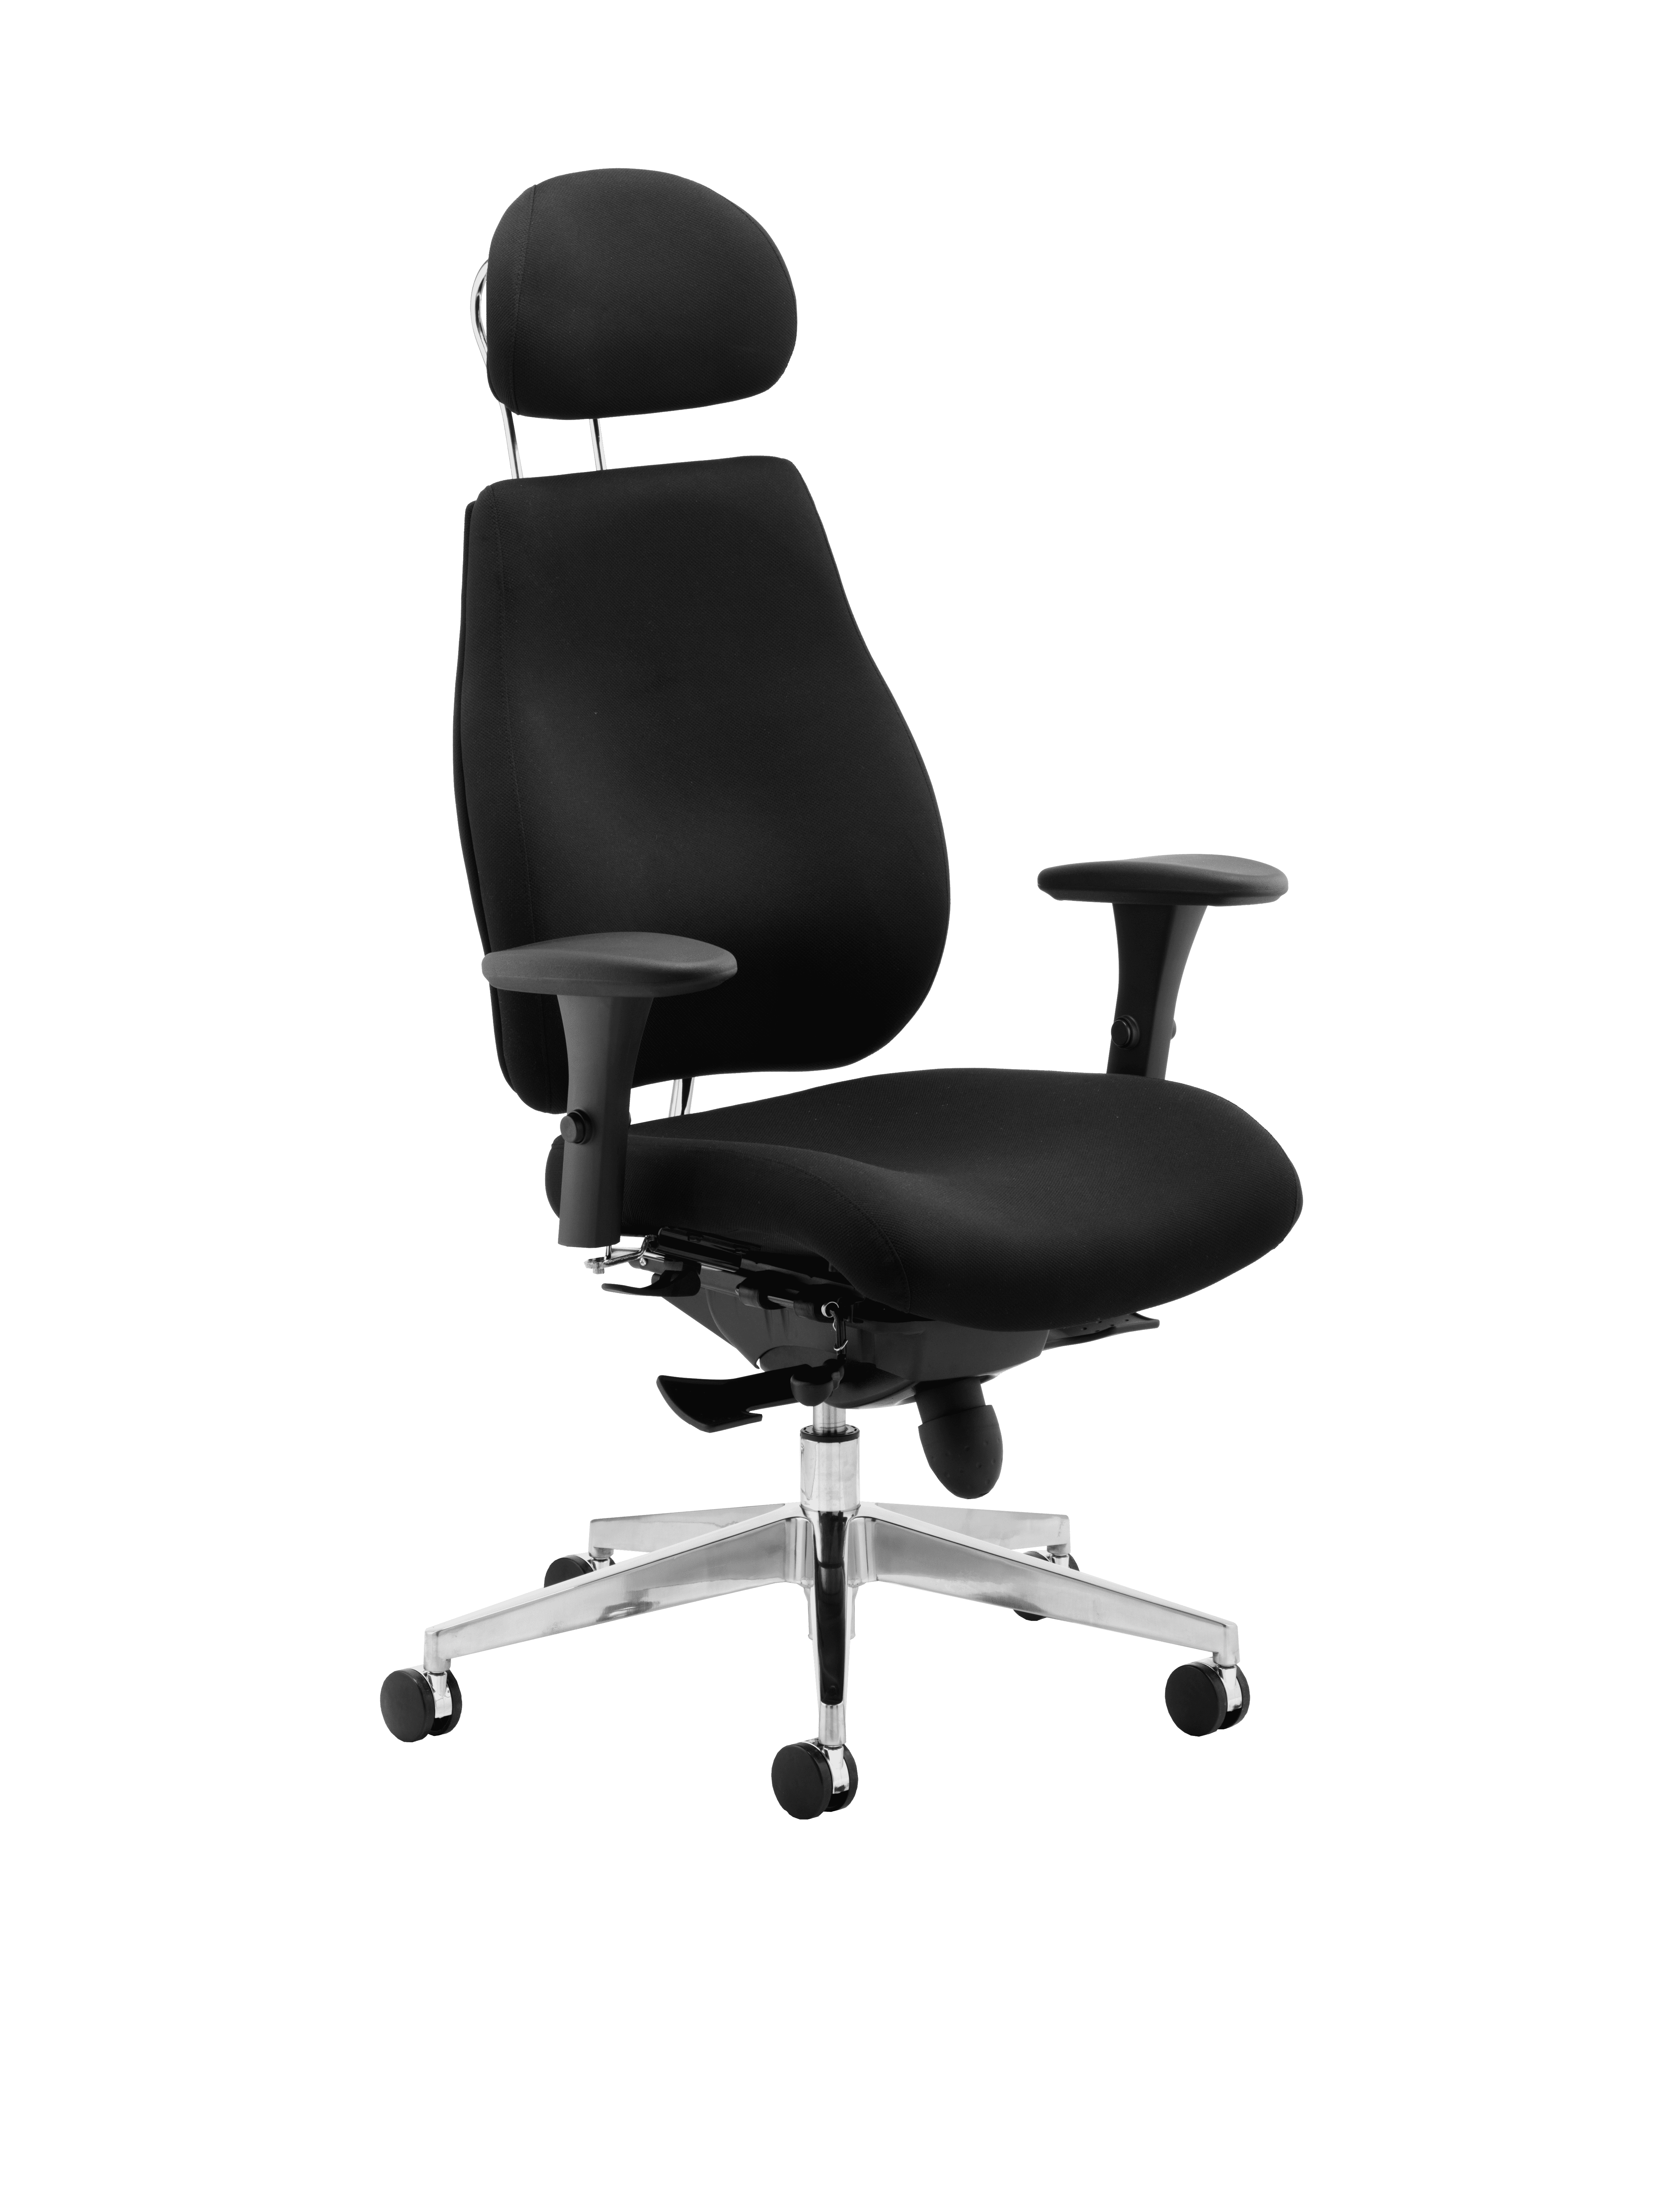 Chiro Plus Ergo Posture Chair With Headrest